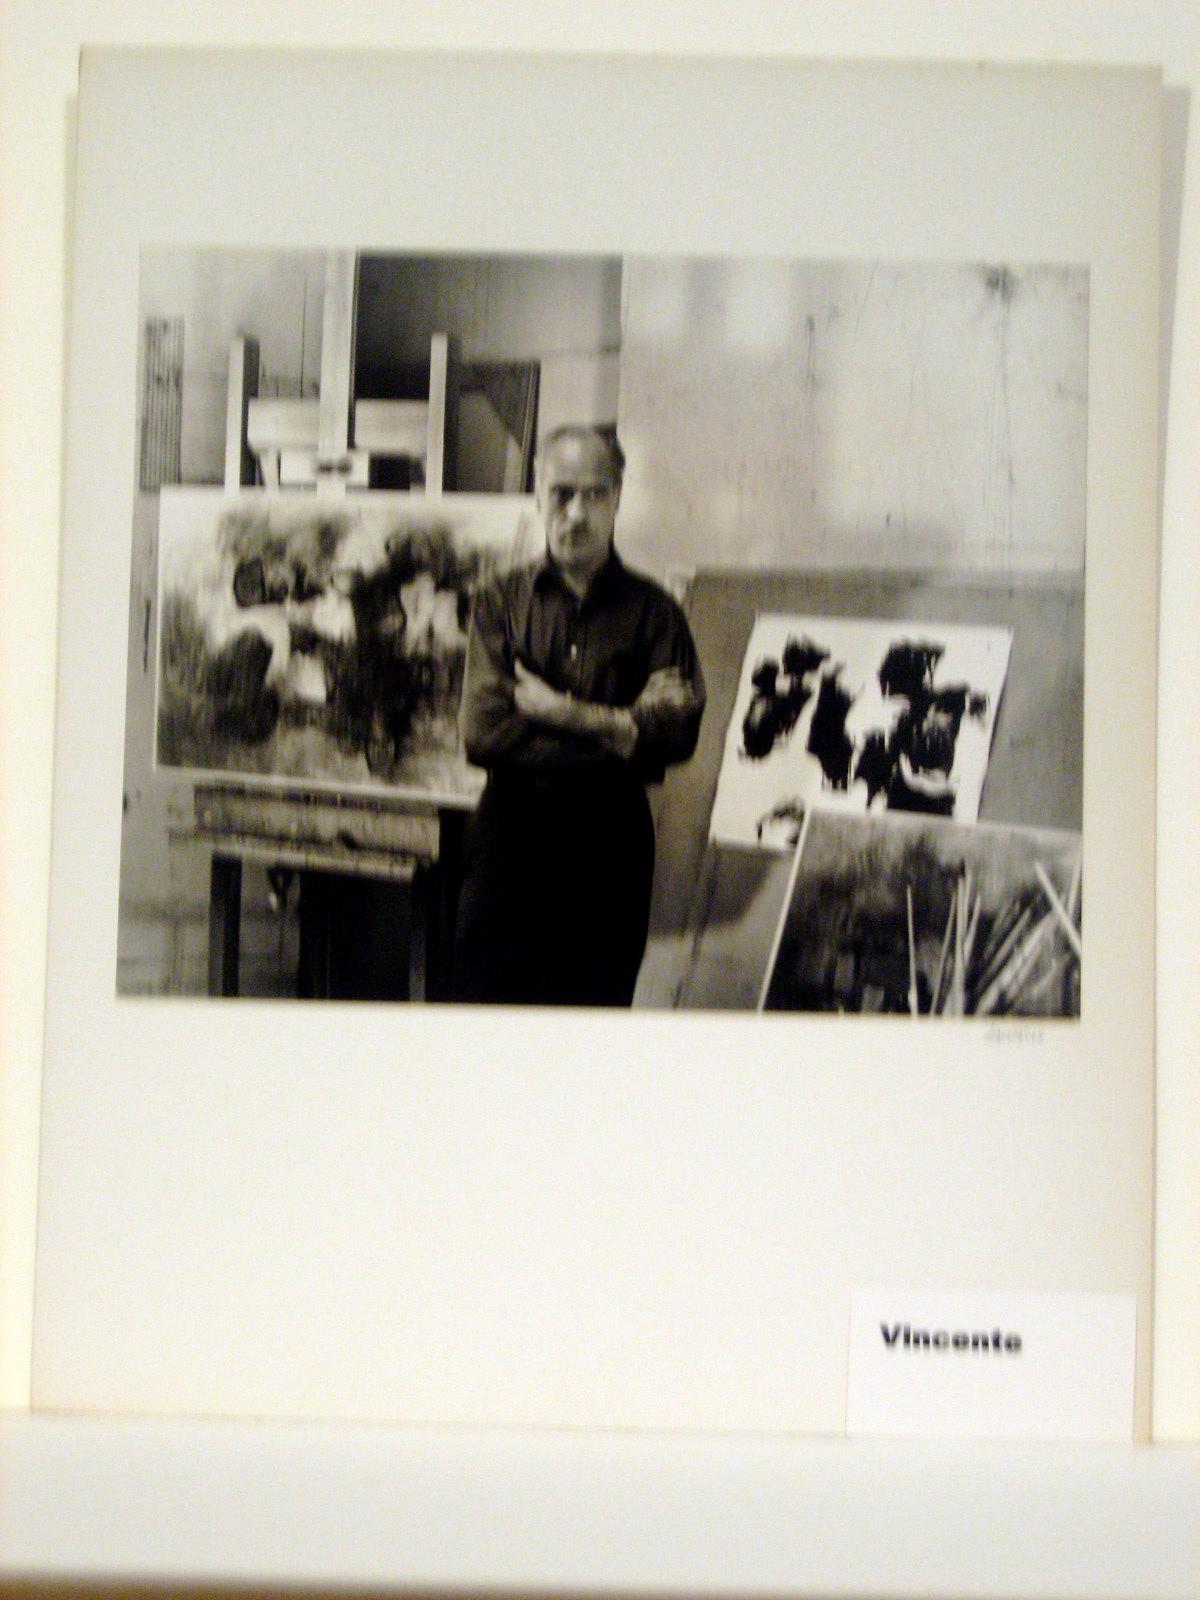 Vincenti 2.jpg